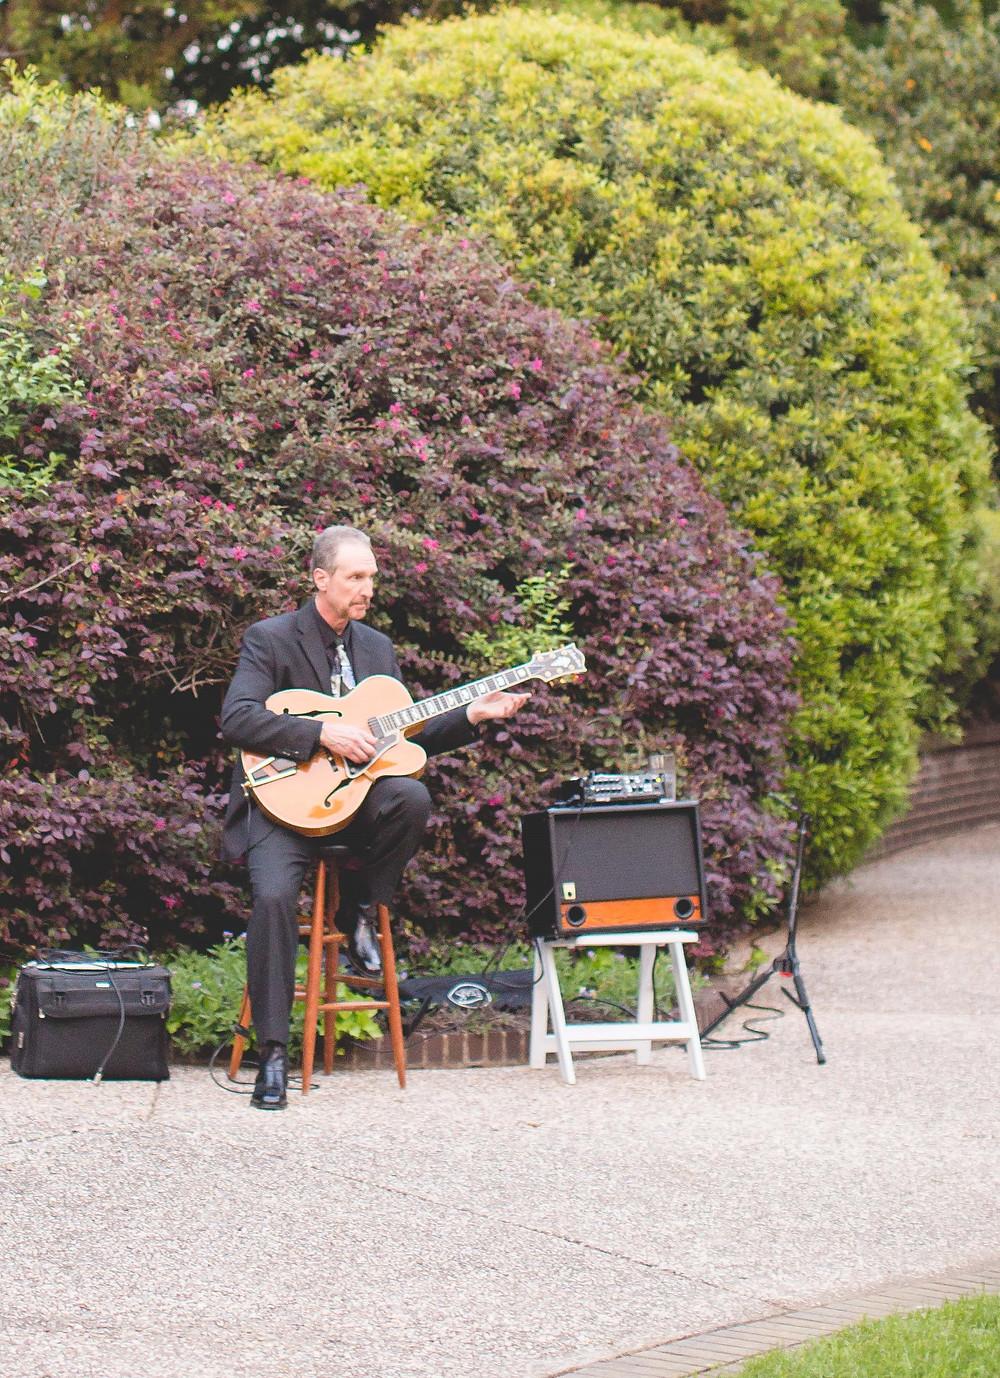 guitar music for texas discovery gardens